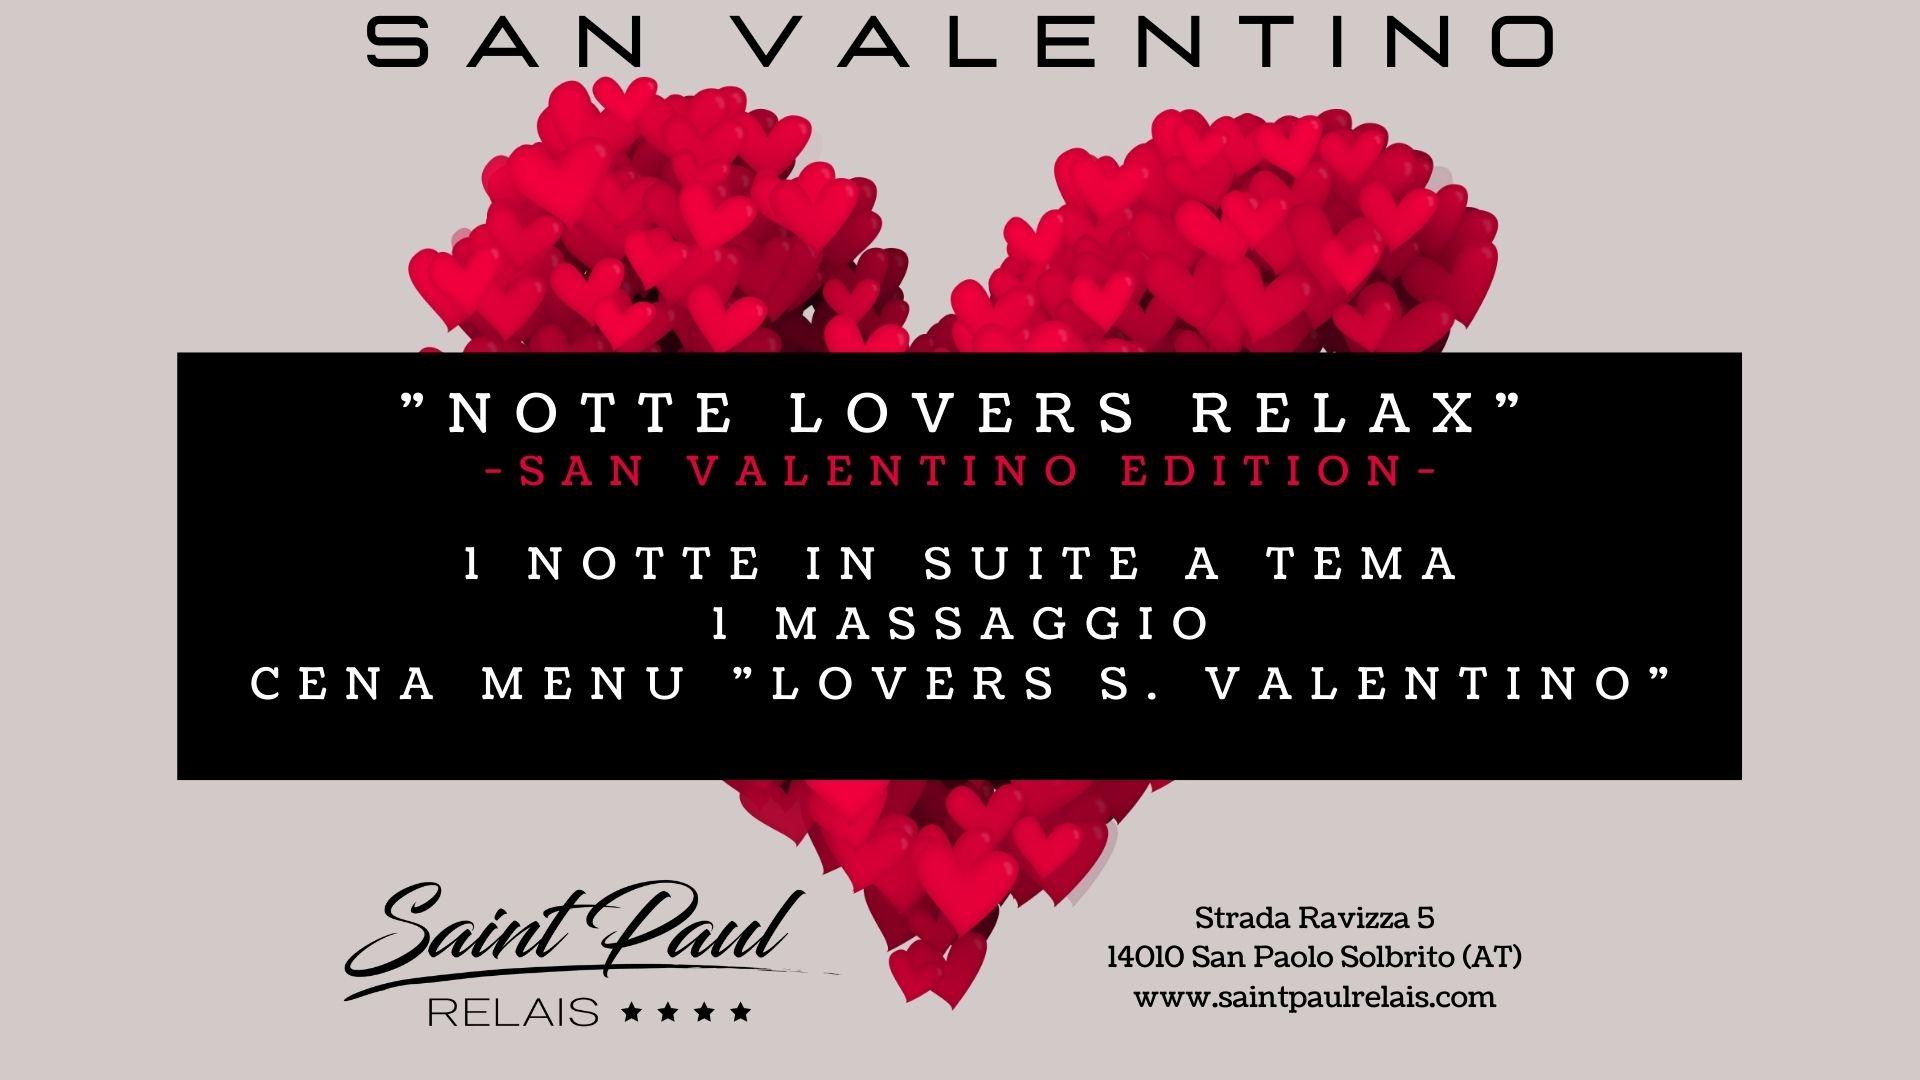 1 notte lovers relax San Valentino Saint Paul Relais